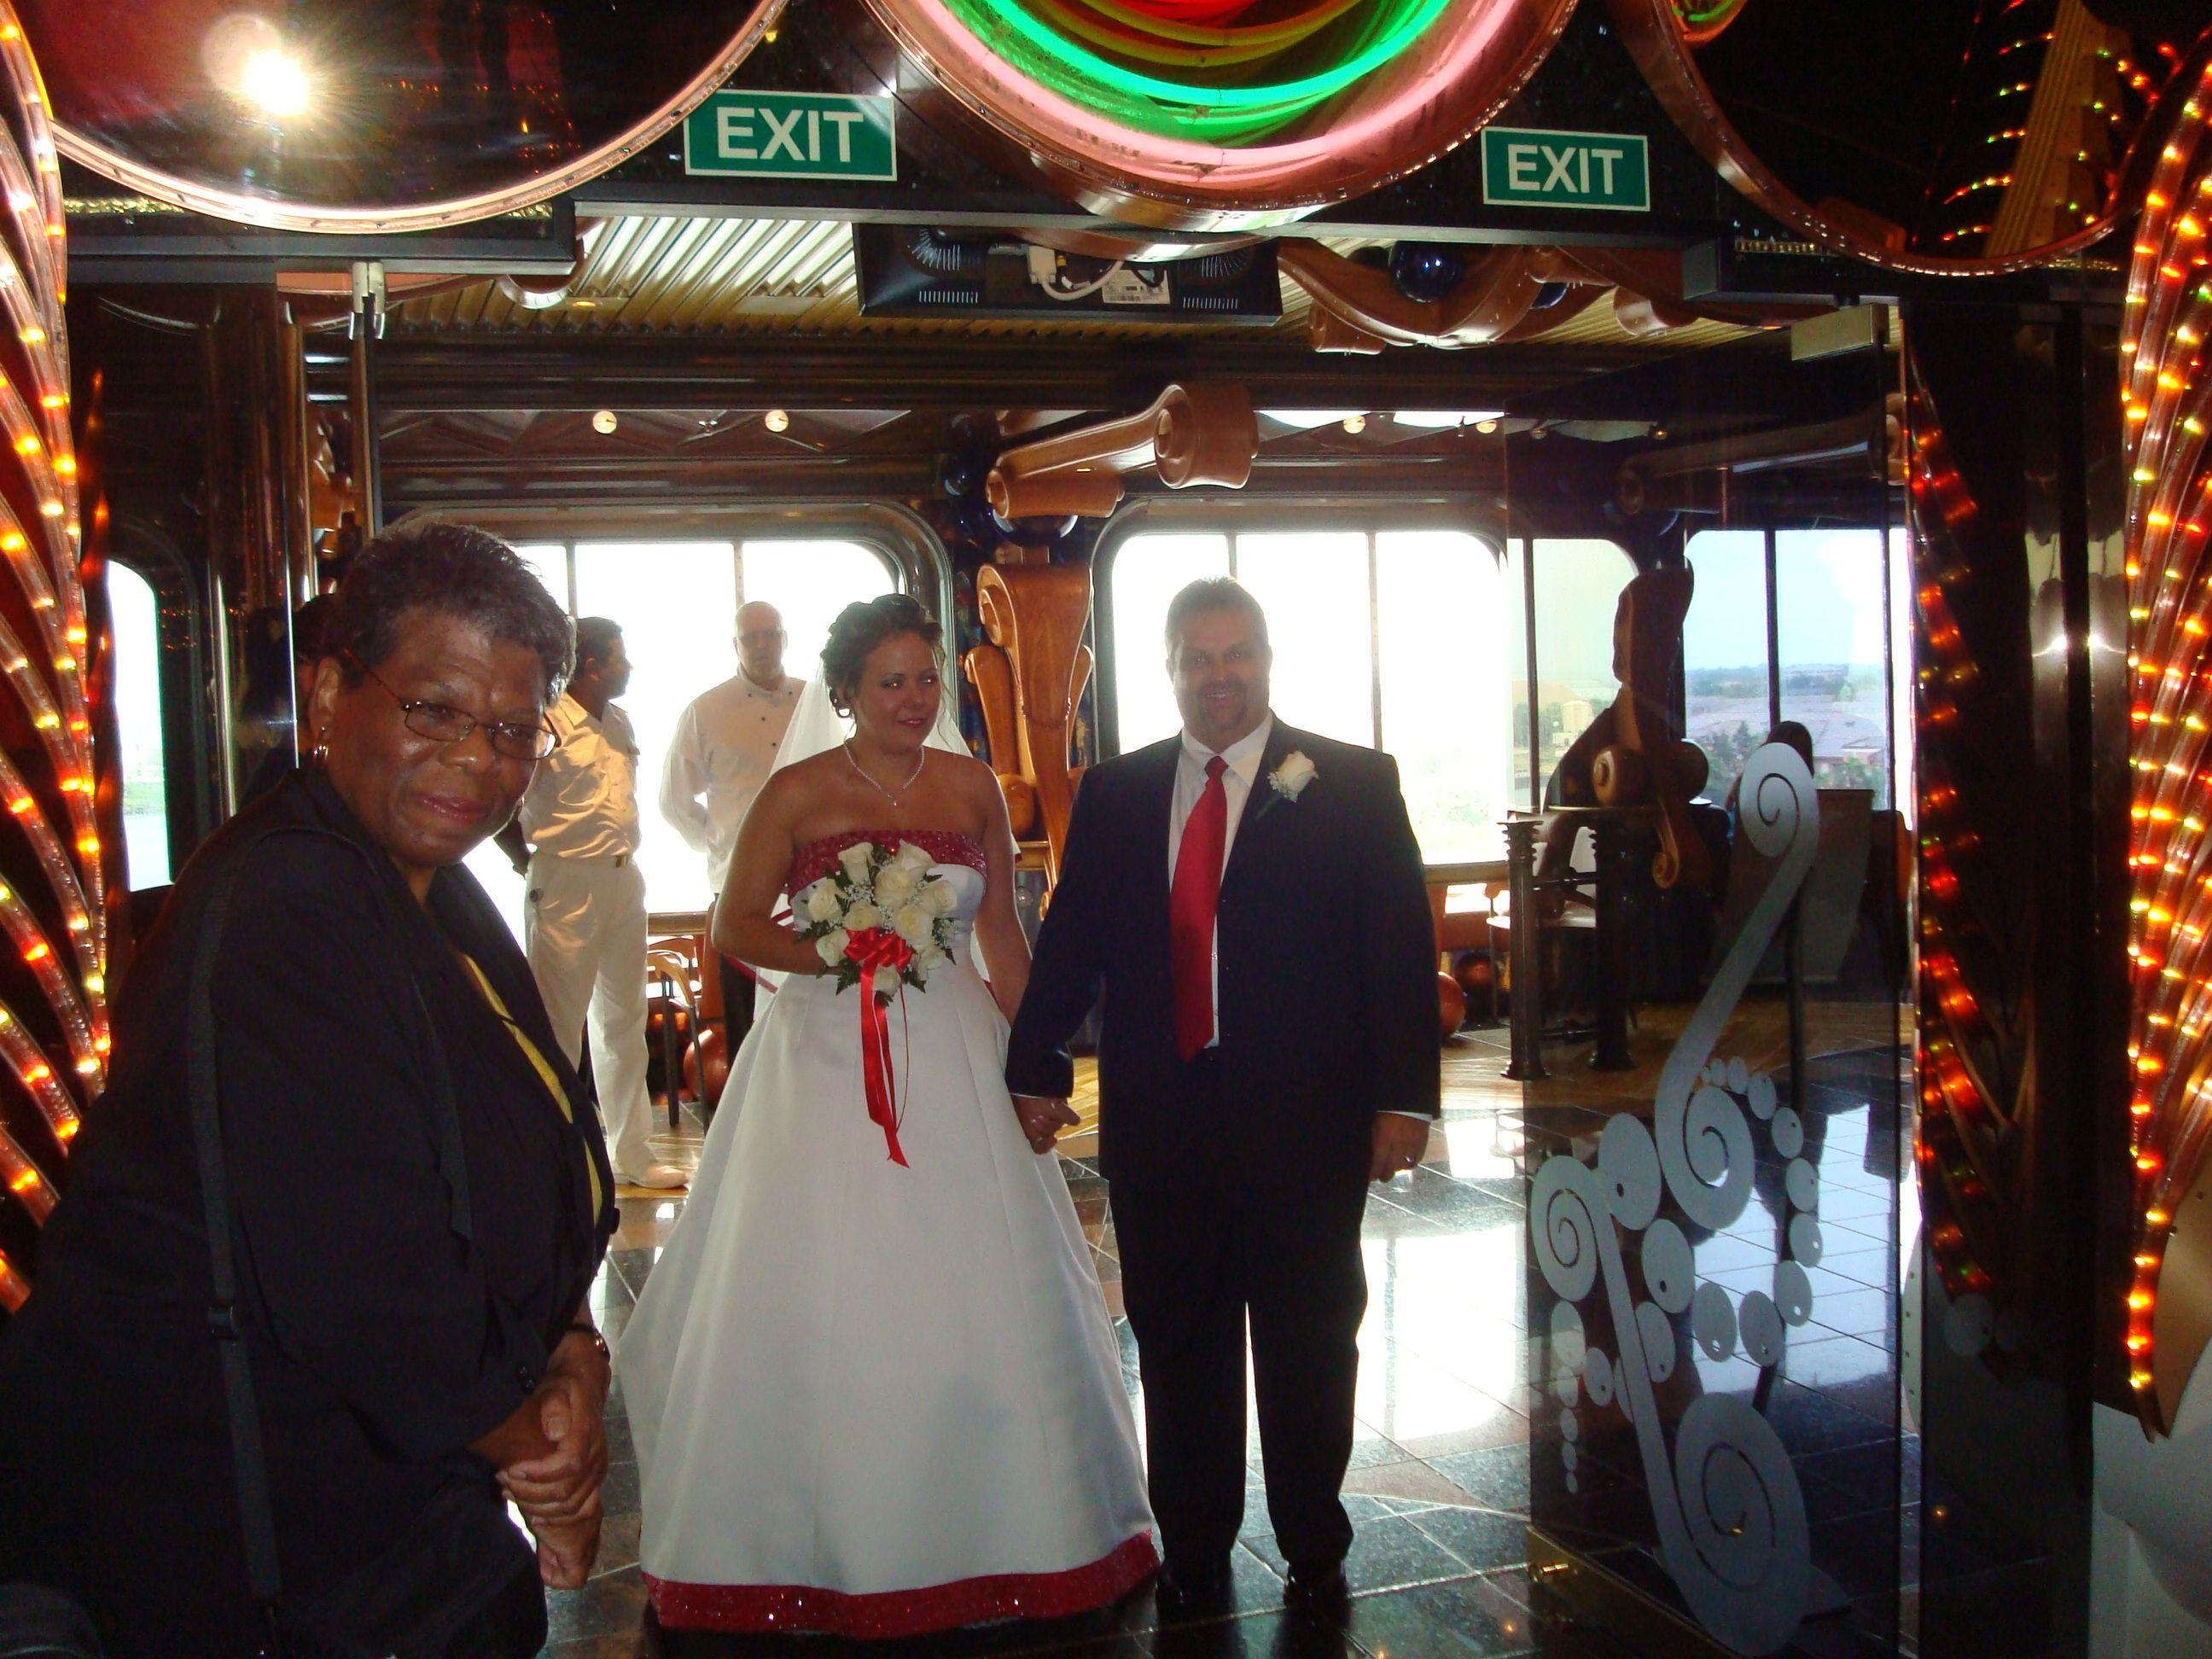 carnival cruise wedding Carnival cruise wedding, Cruise